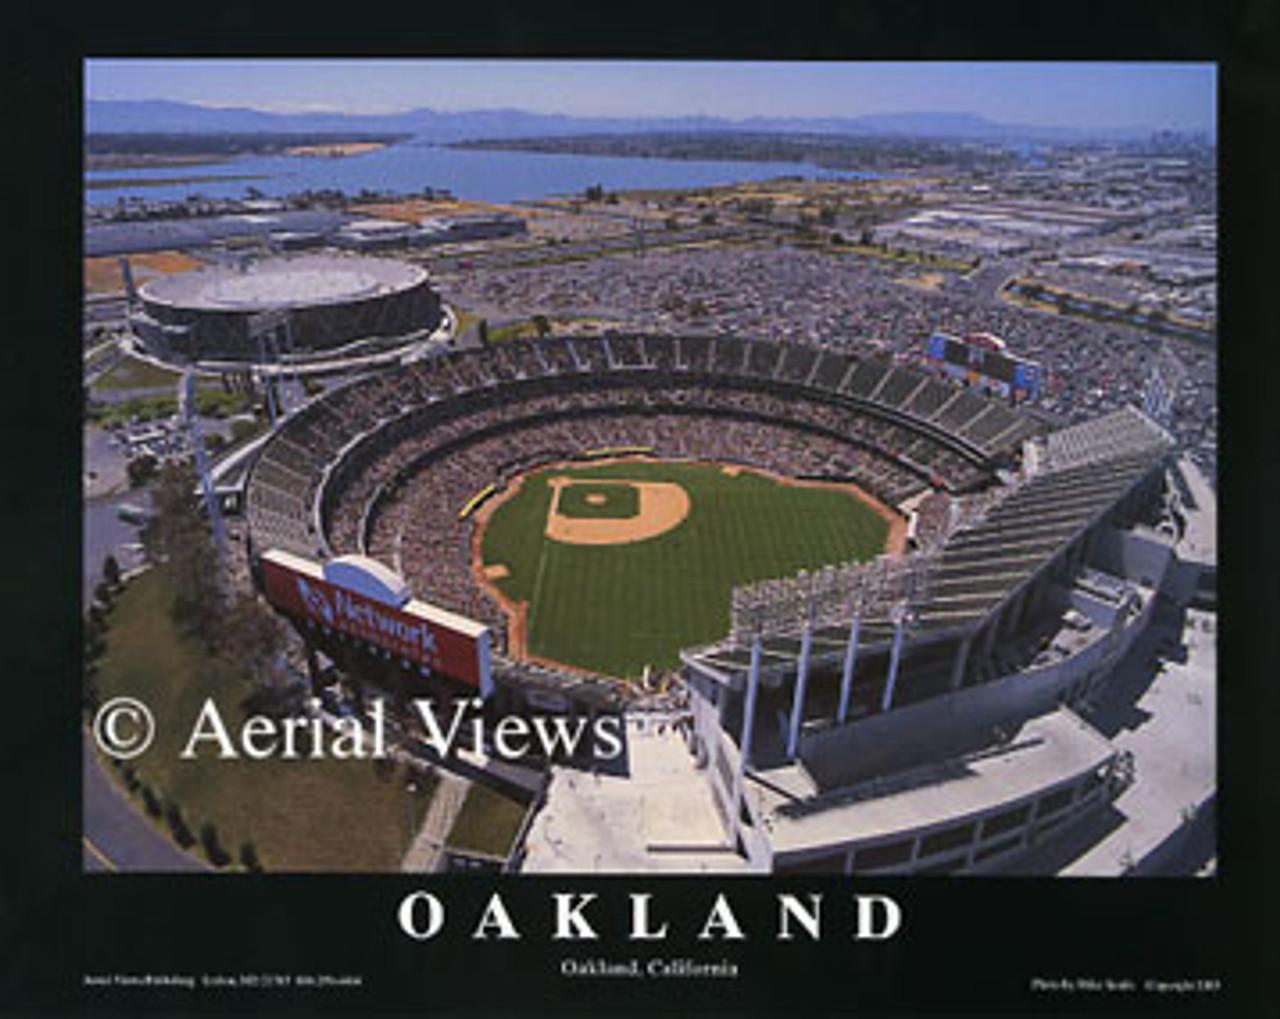 Oakland Coliseum Aerial Poster 1